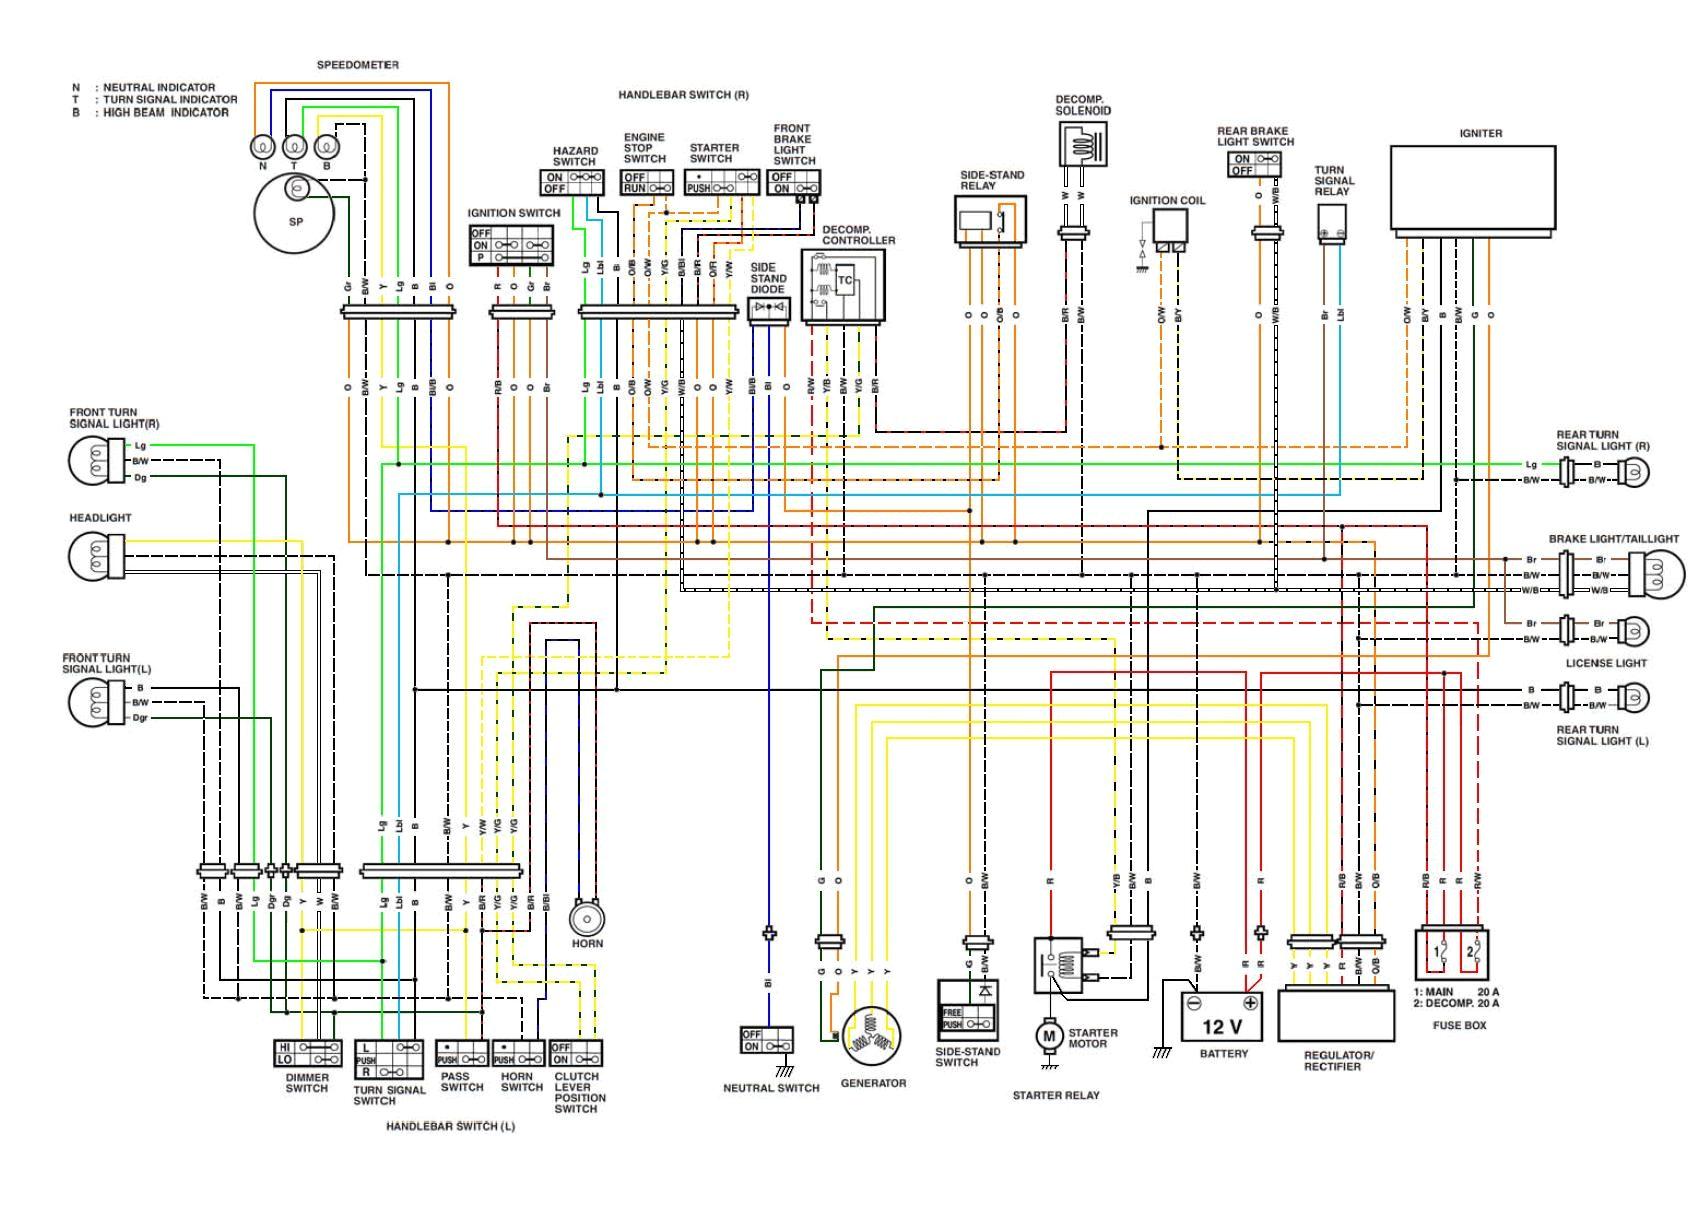 sportster wiring diagram awesome 1980 harley davidson shovelhead wiring diagram of sportster wiring diagram jpg